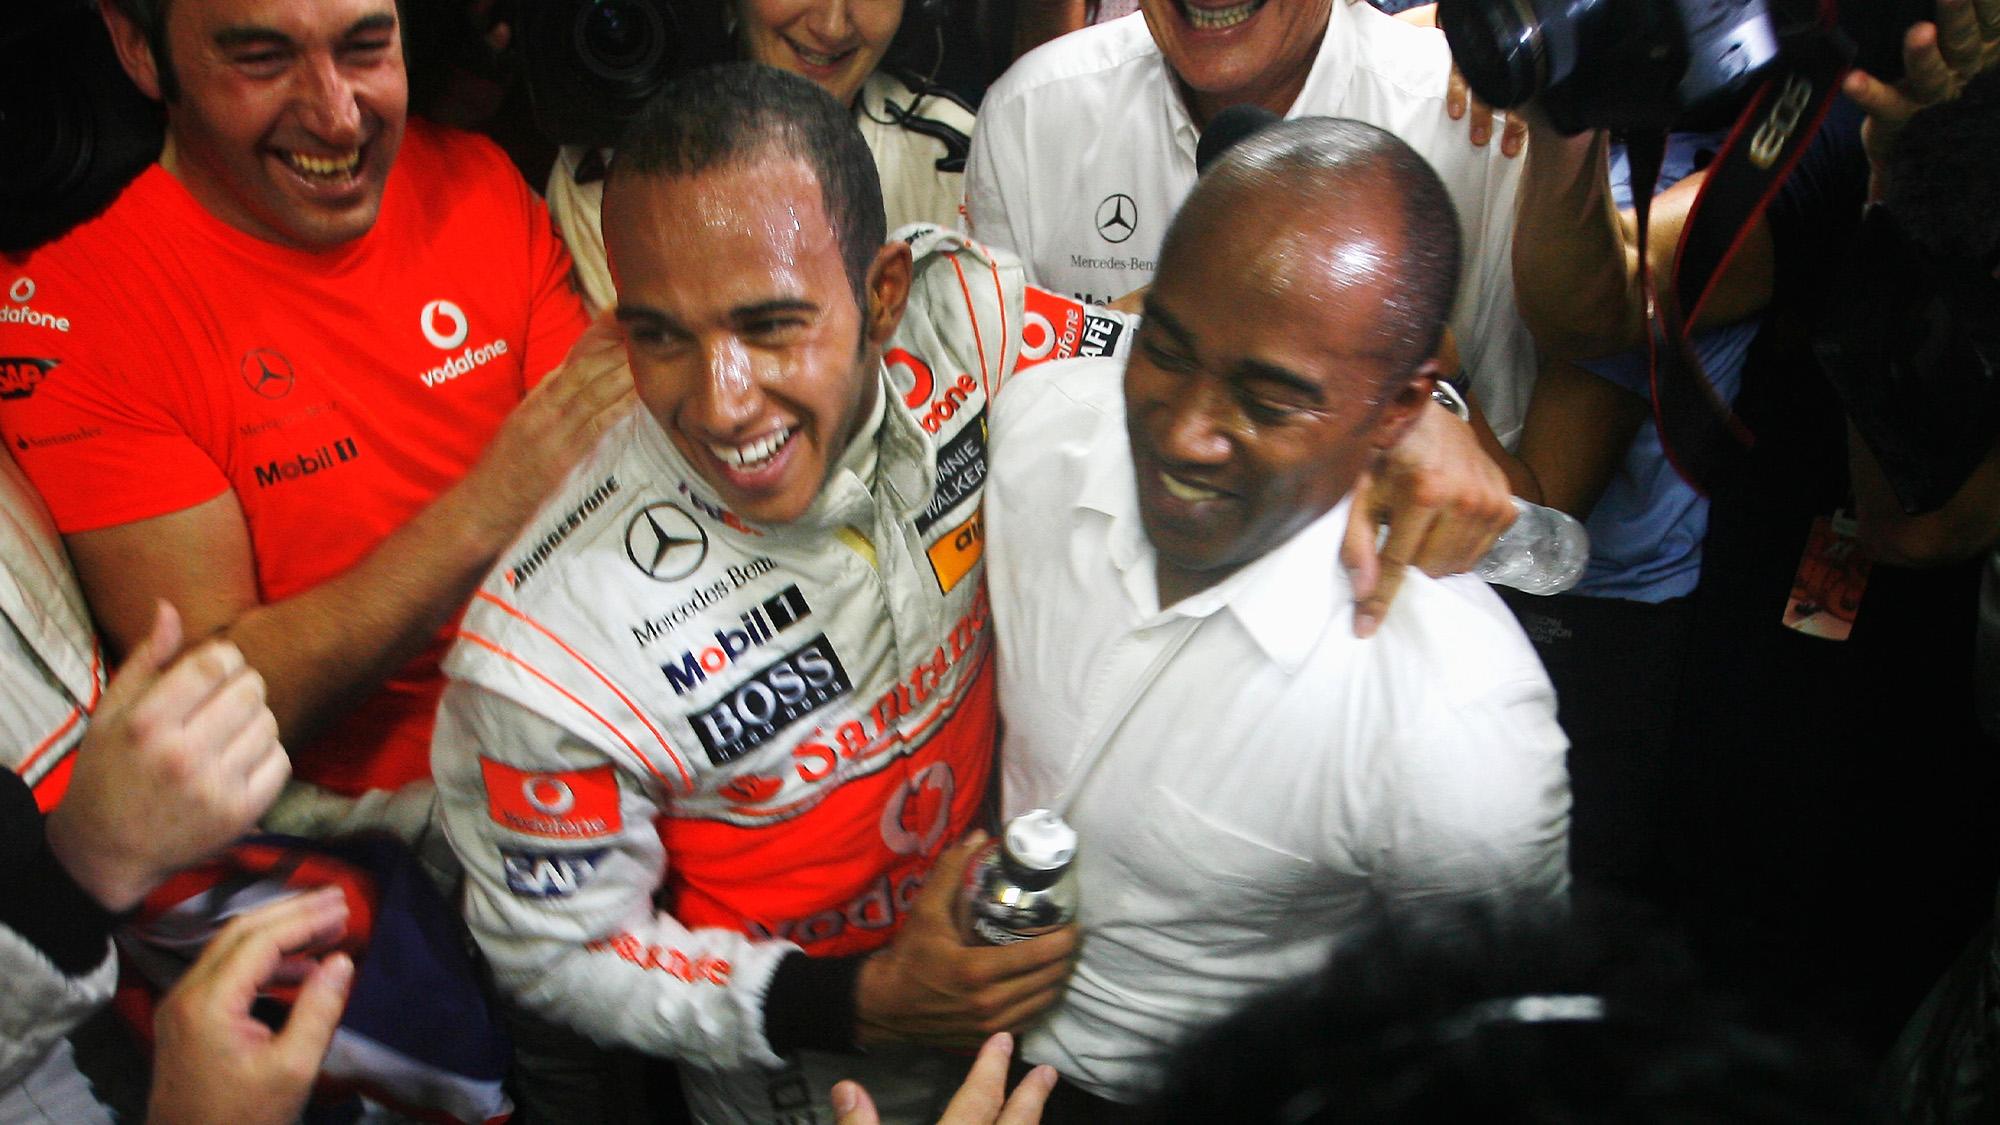 Lewis Hamilton celebrates winning his first Formula 1 race